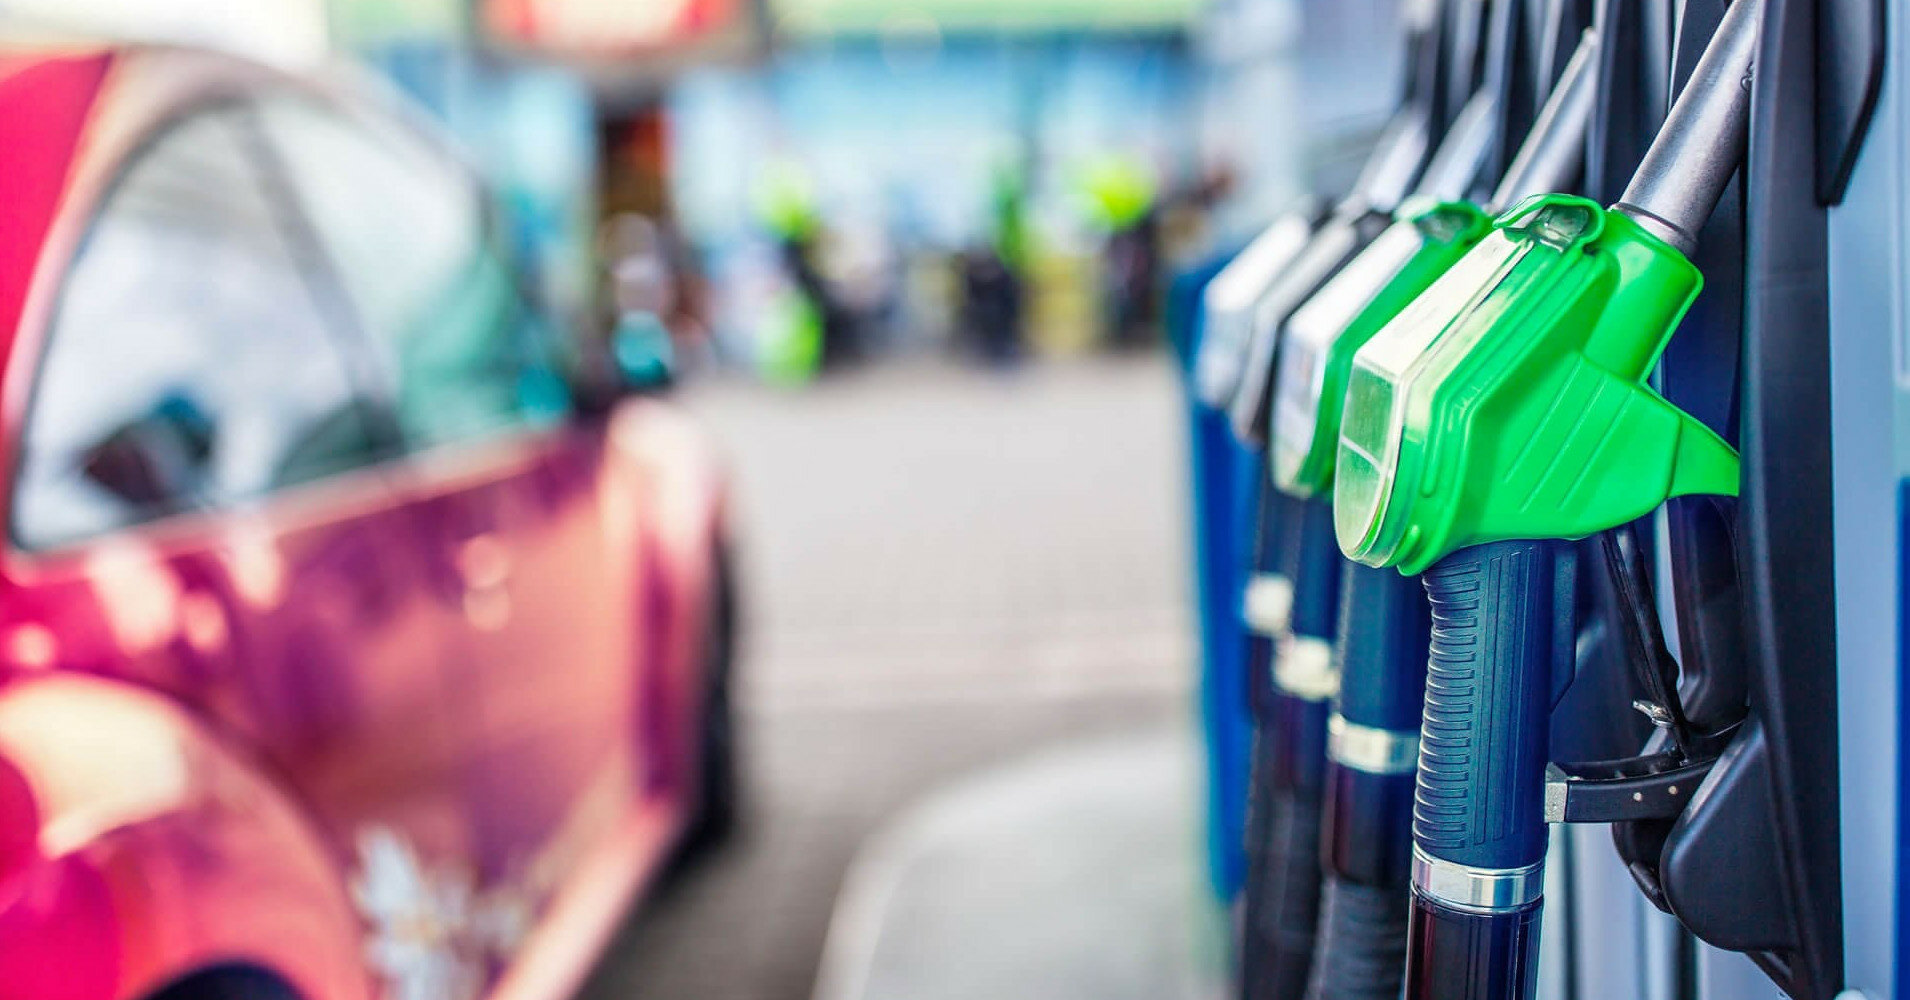 Украина входит в топ-5 стран по росту цен на топливо